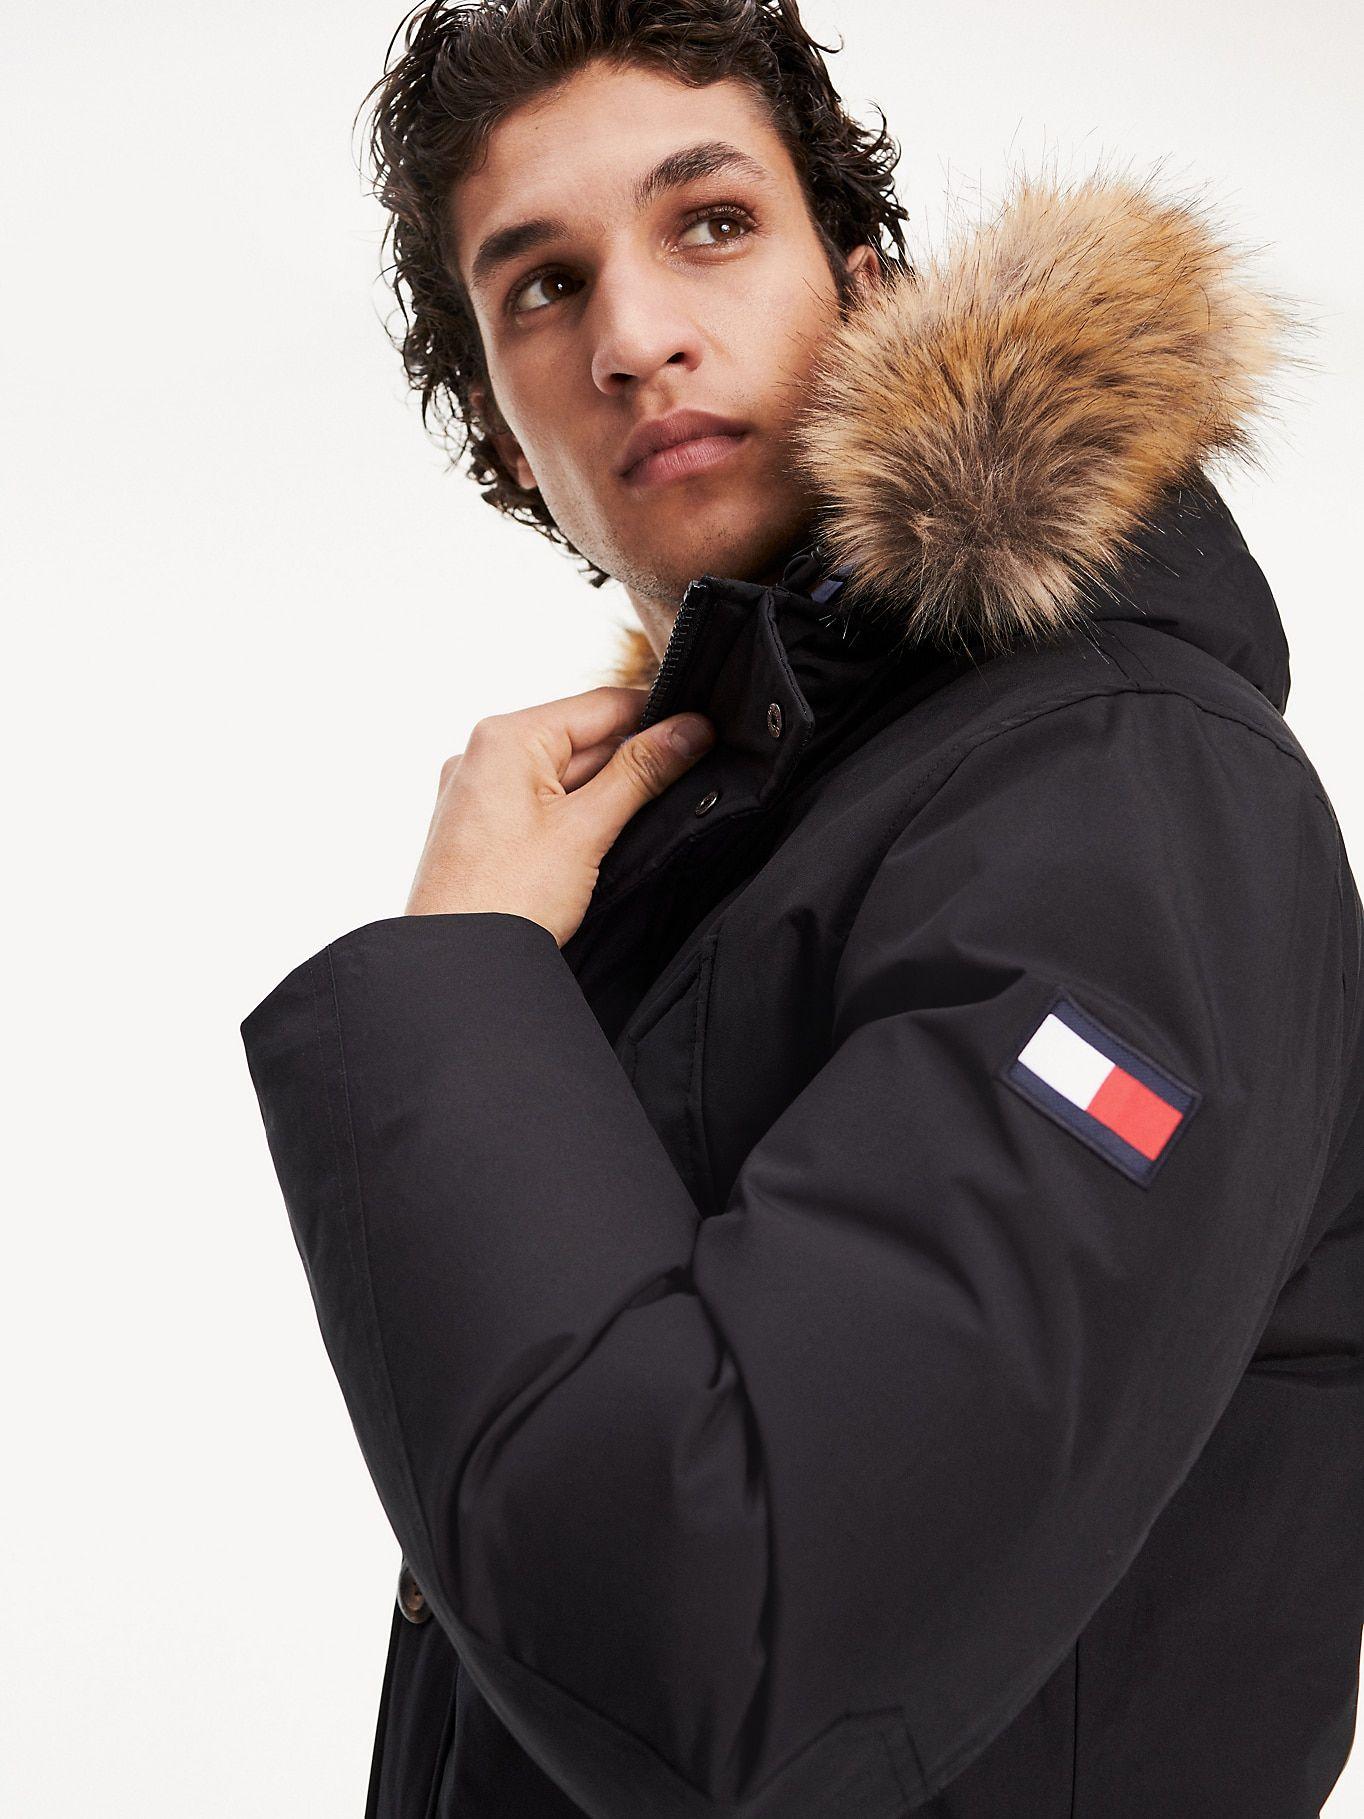 Down Filled Parka Sky Captain Tommy Hilfiger Tommy Hilfiger Outerwear Jackets Men S Coats Jackets [ 1819 x 1364 Pixel ]